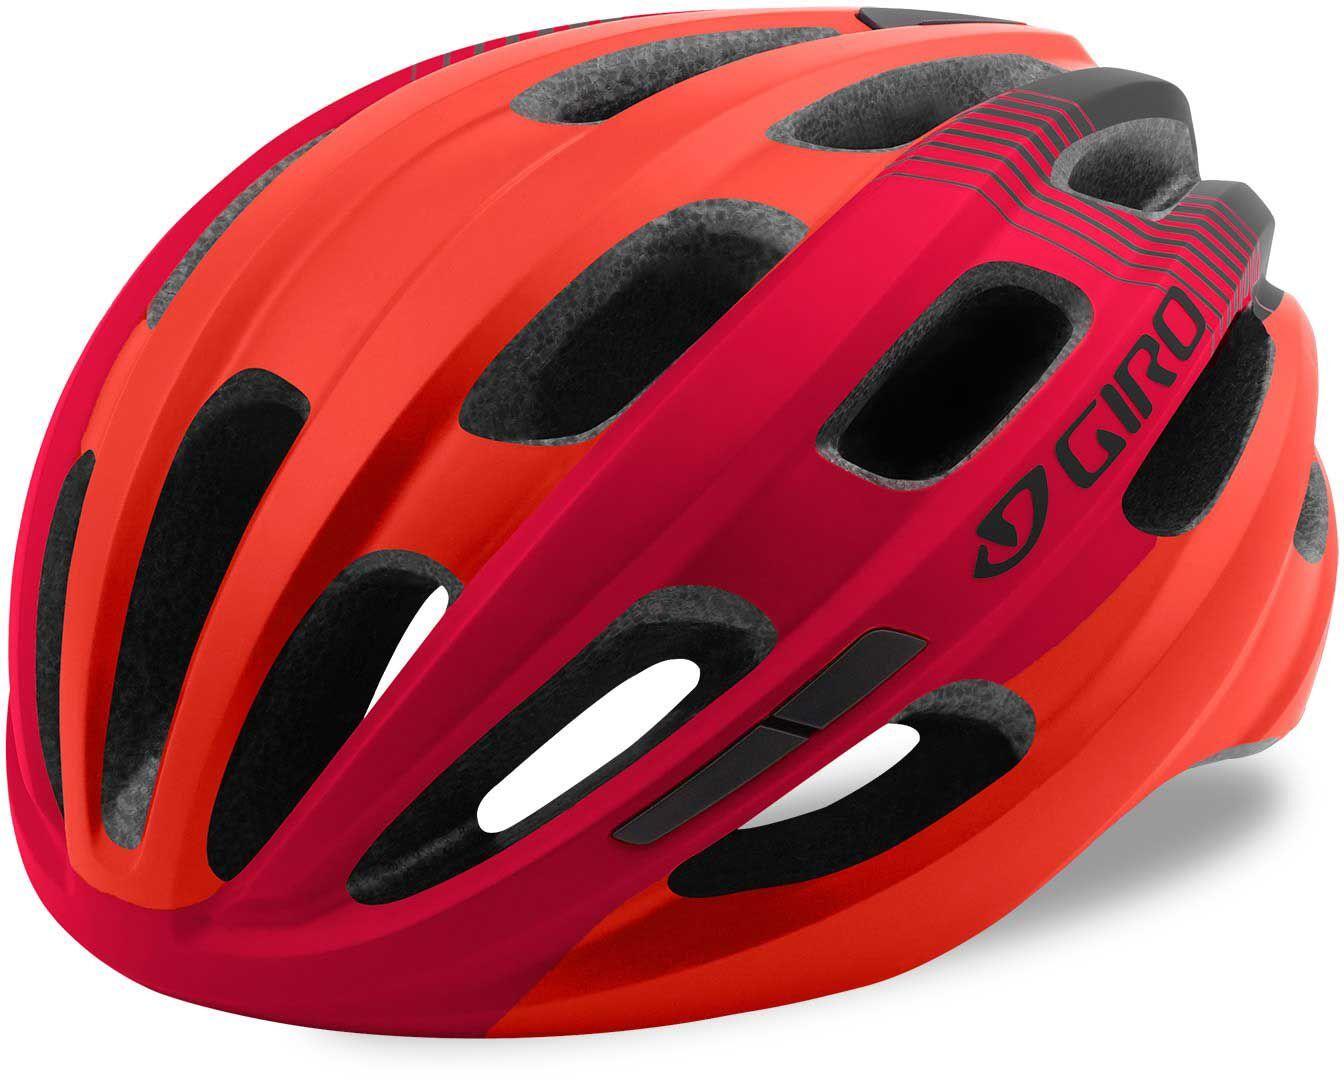 Giro Adult Isode MIPS Bike Helmet, Matte Red/Black